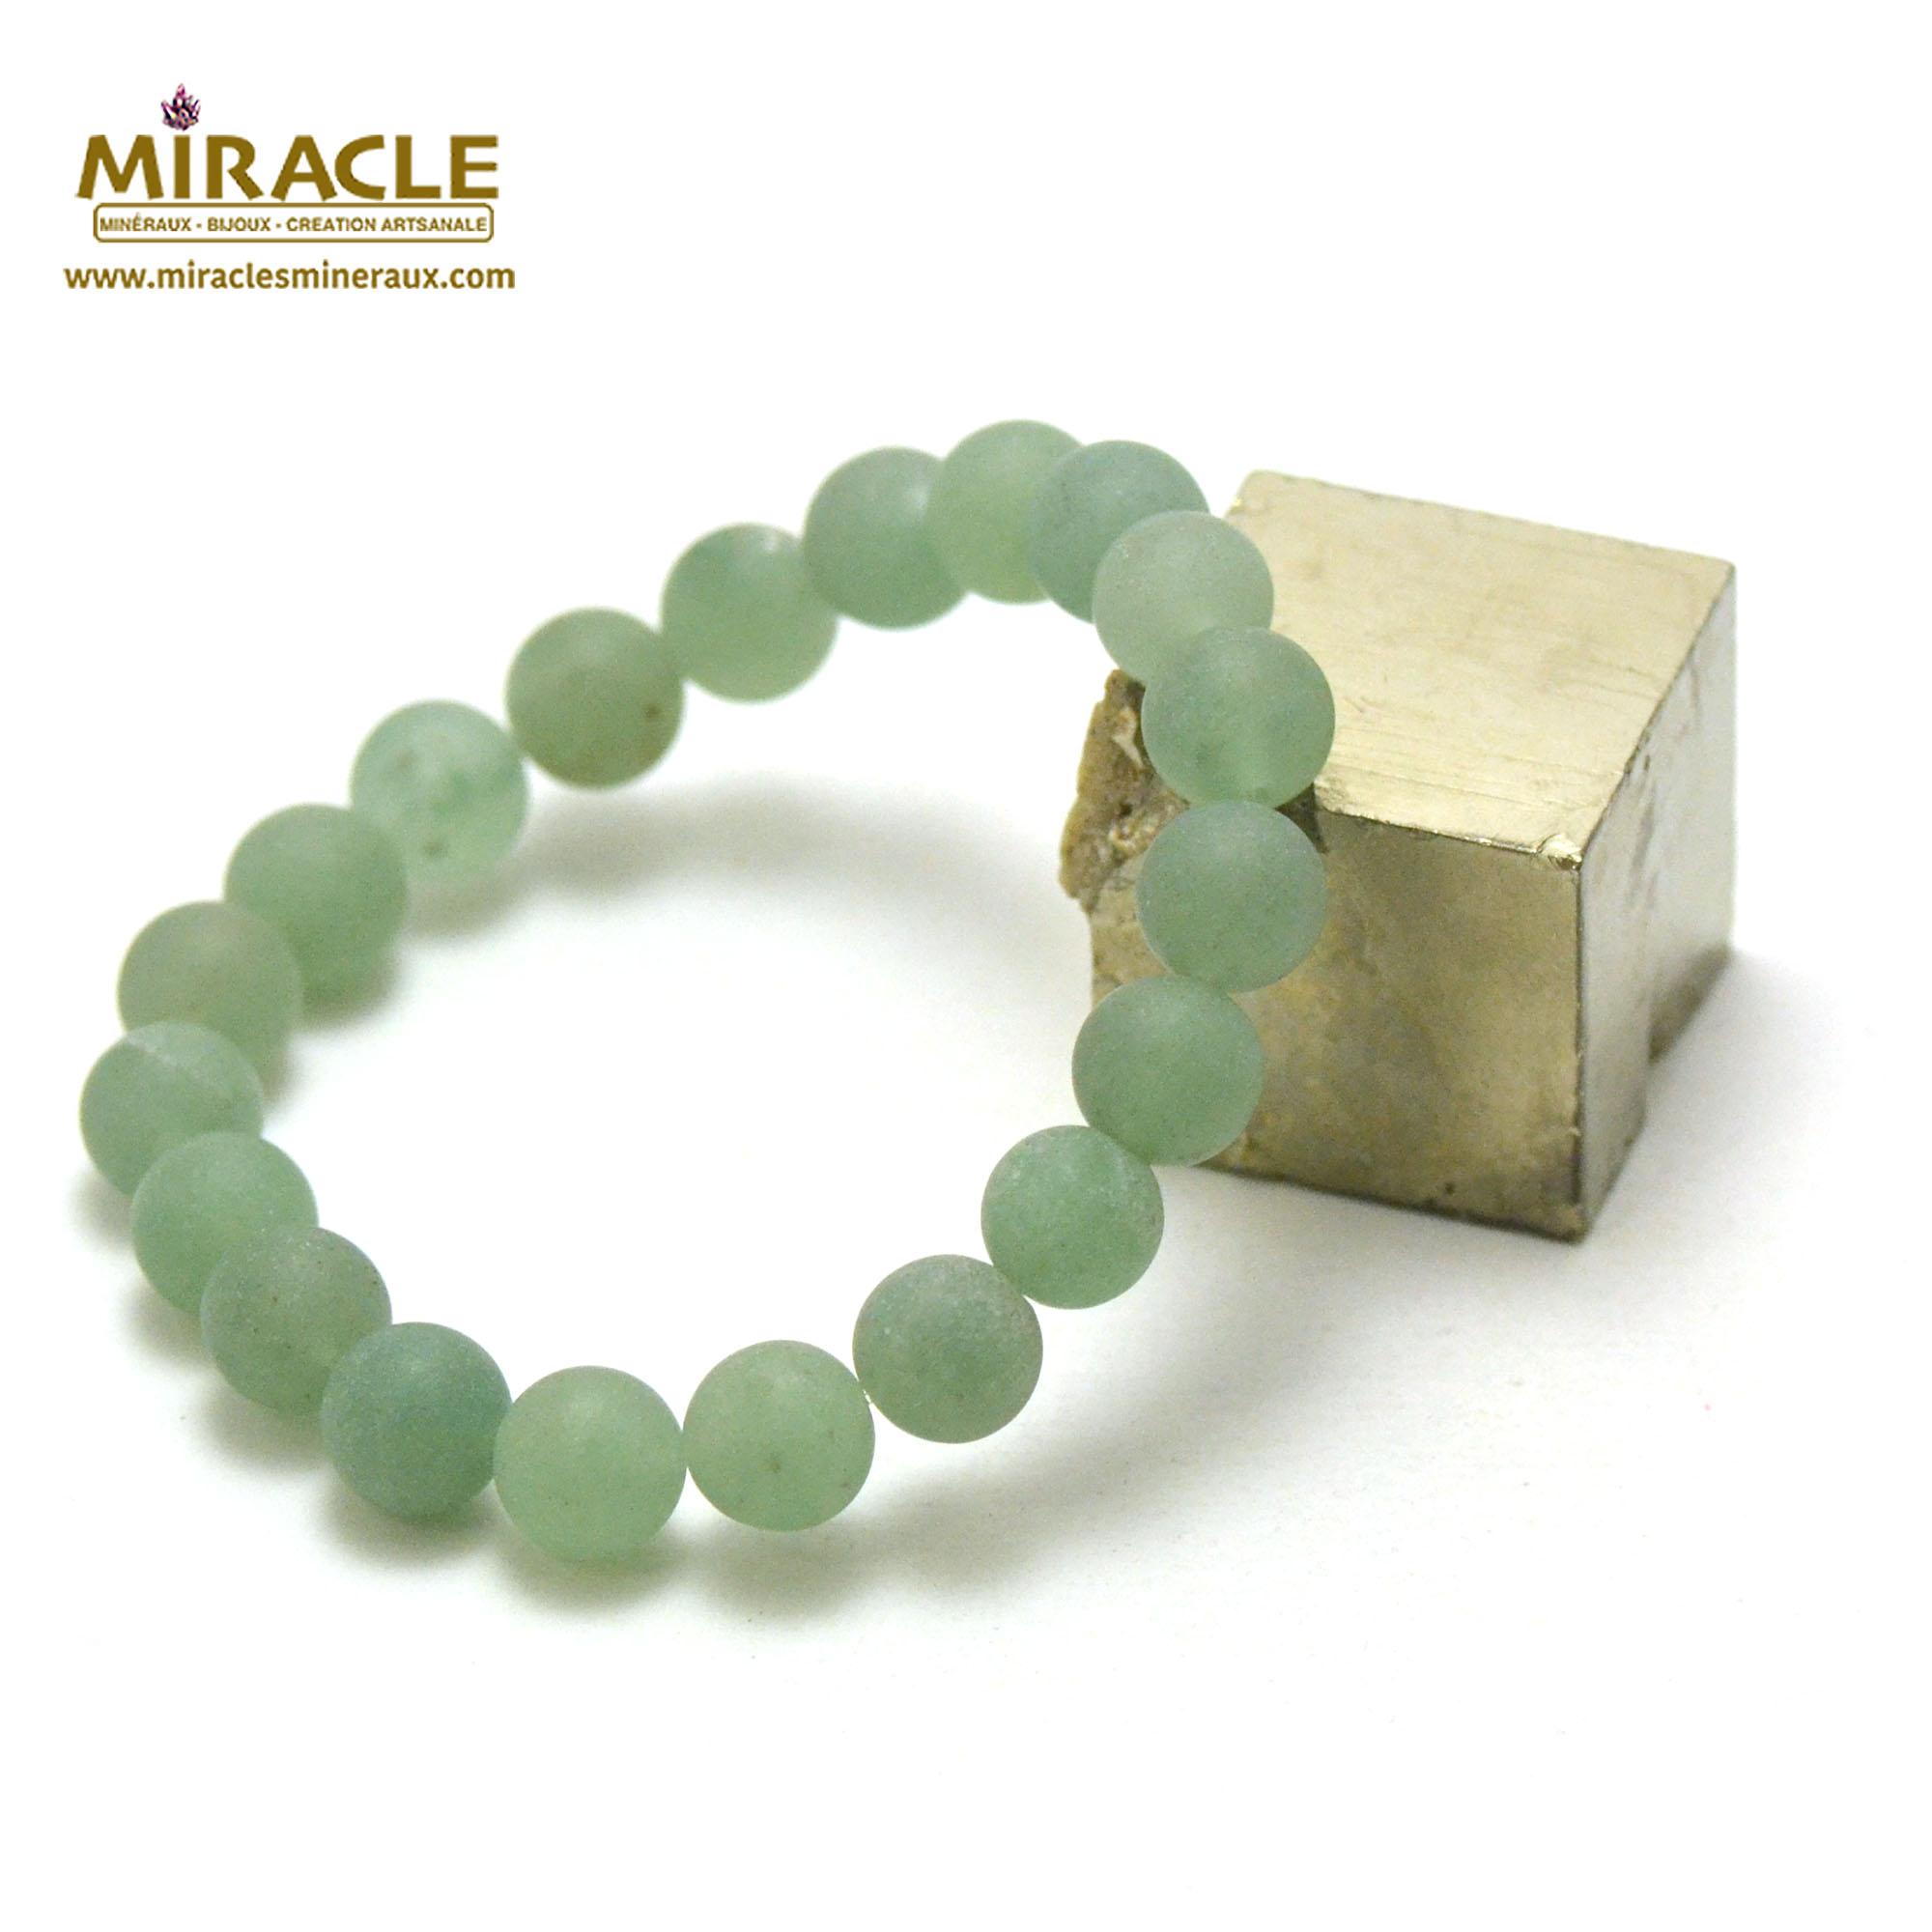 bracelet aventurine givré  perle mat ronde 10 mm